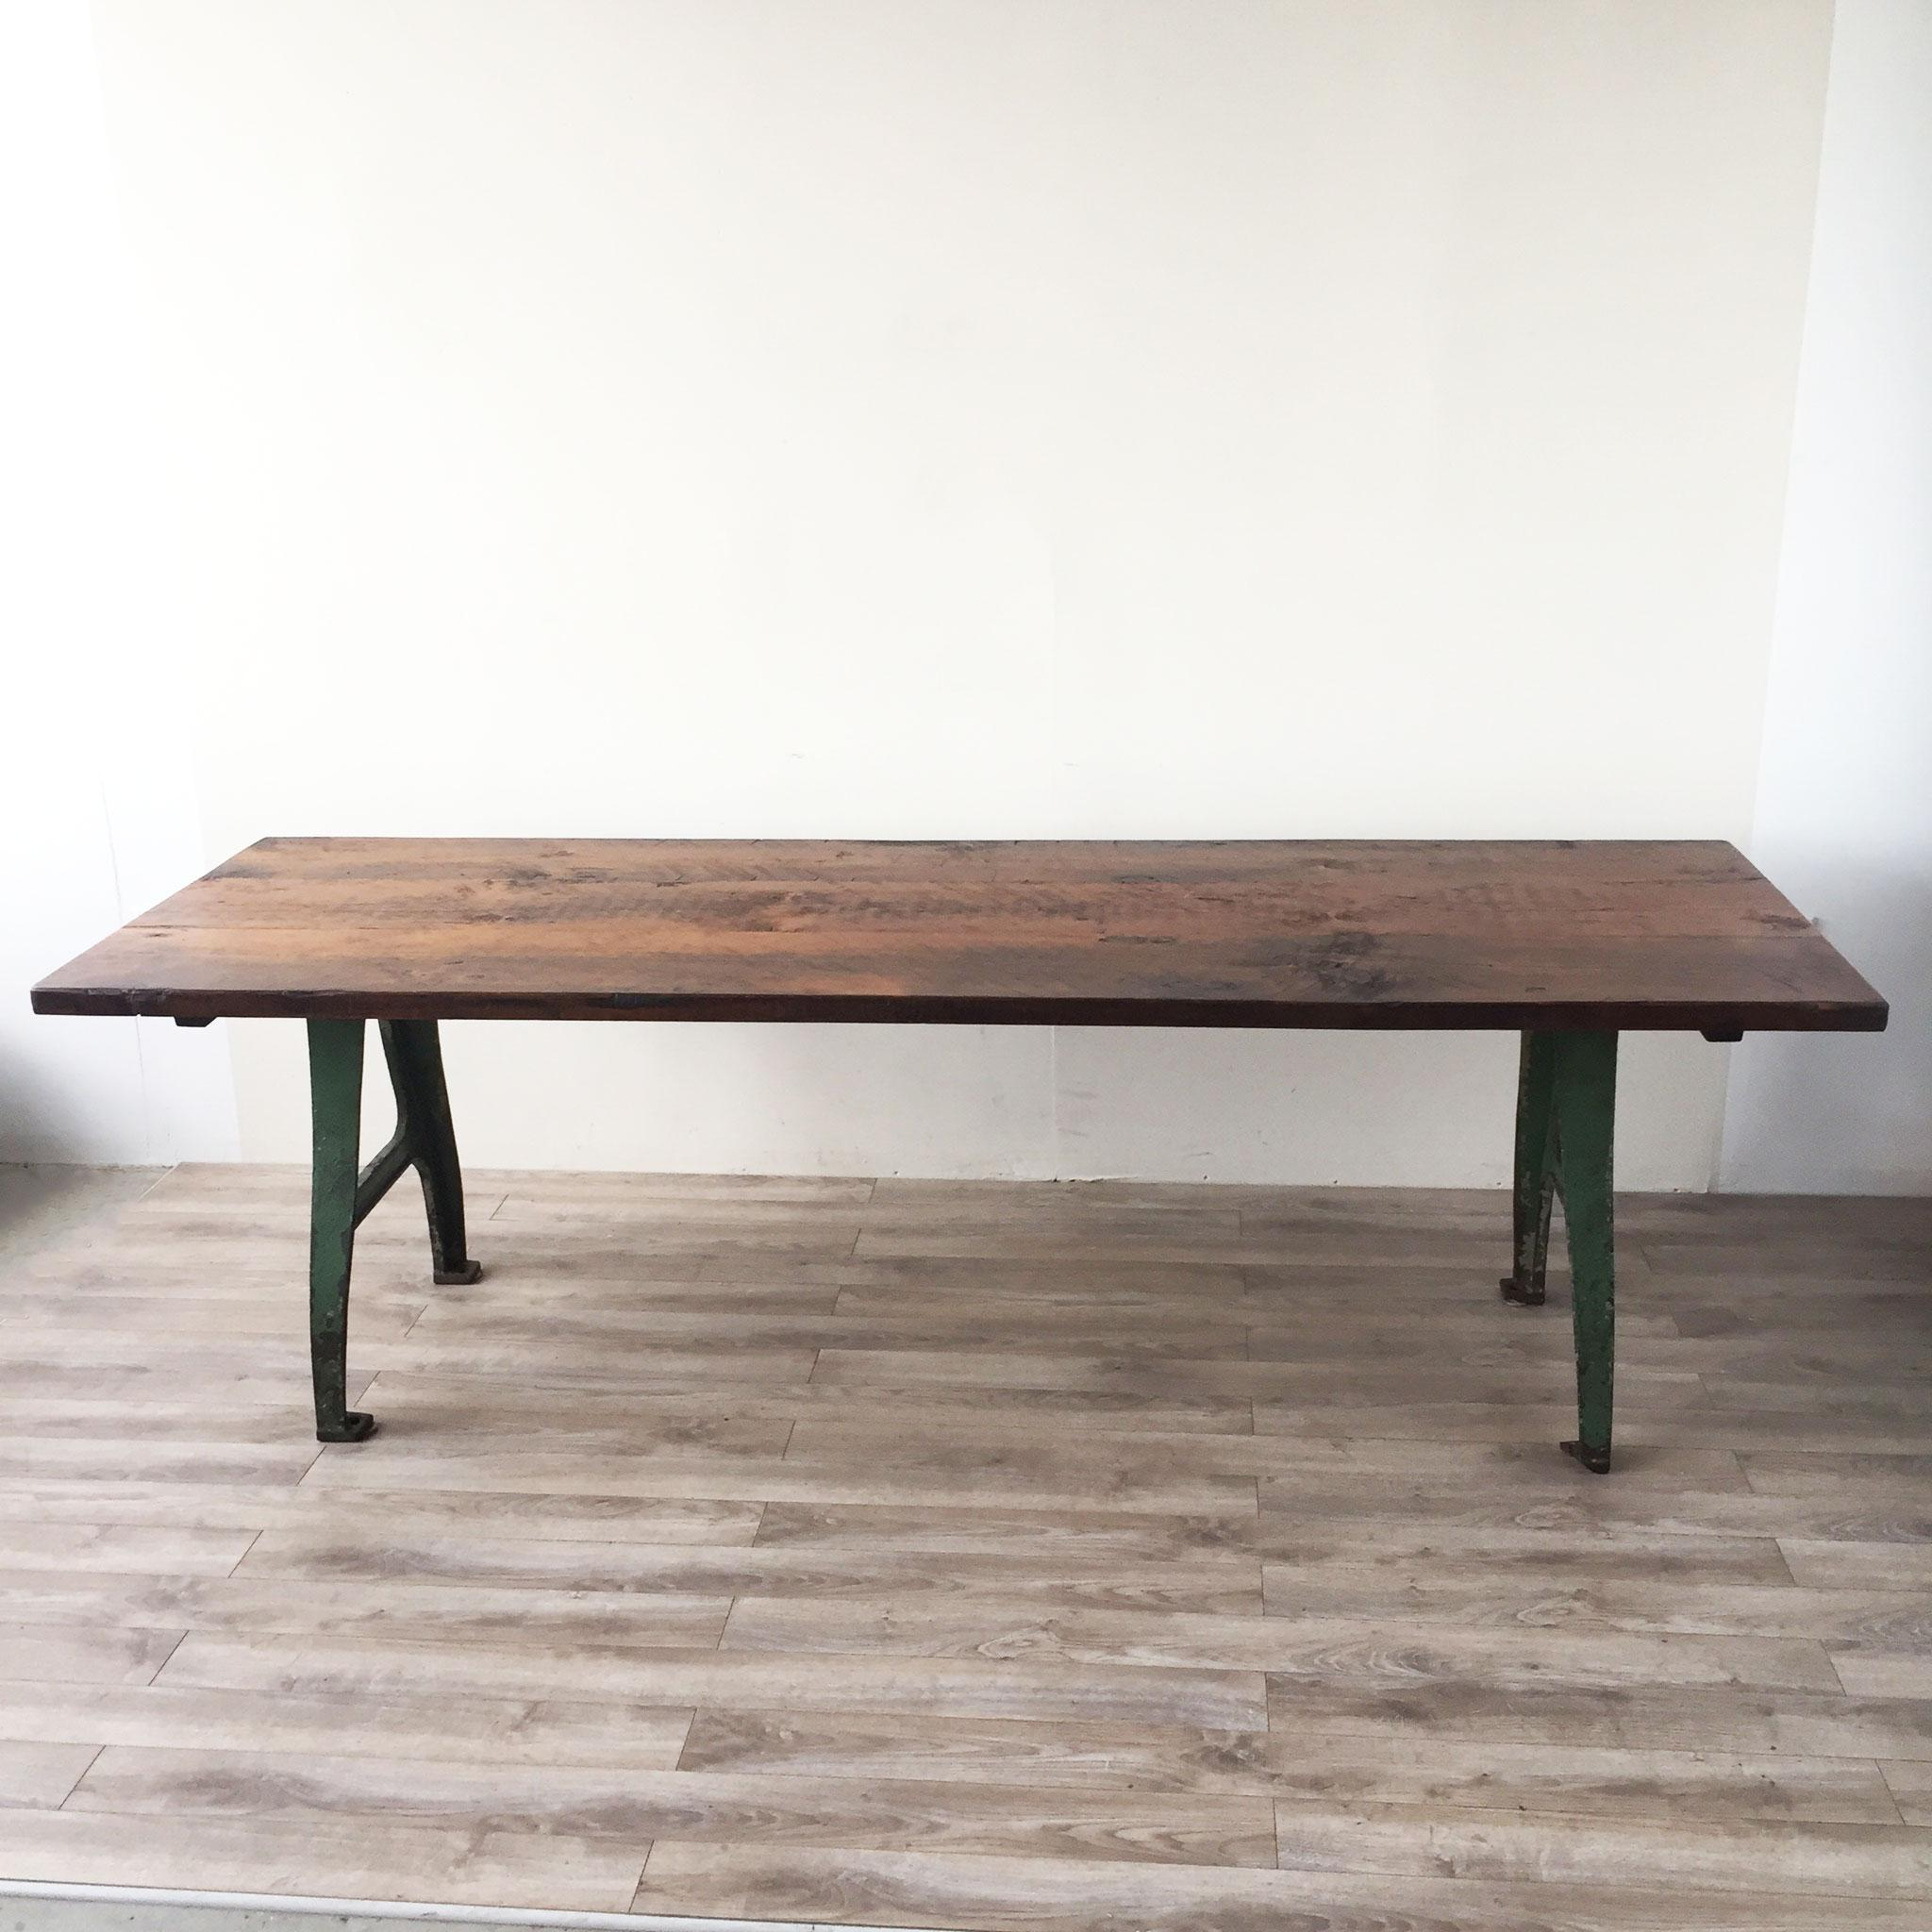 Cast Iron Base Reclaimed Wood Dining Table Chairish : 0ac28b8c c1ba 41e0 aea6 93a52735dd8aaspectfitampwidth640ampheight640 from www.chairish.com size 640 x 640 jpeg 37kB